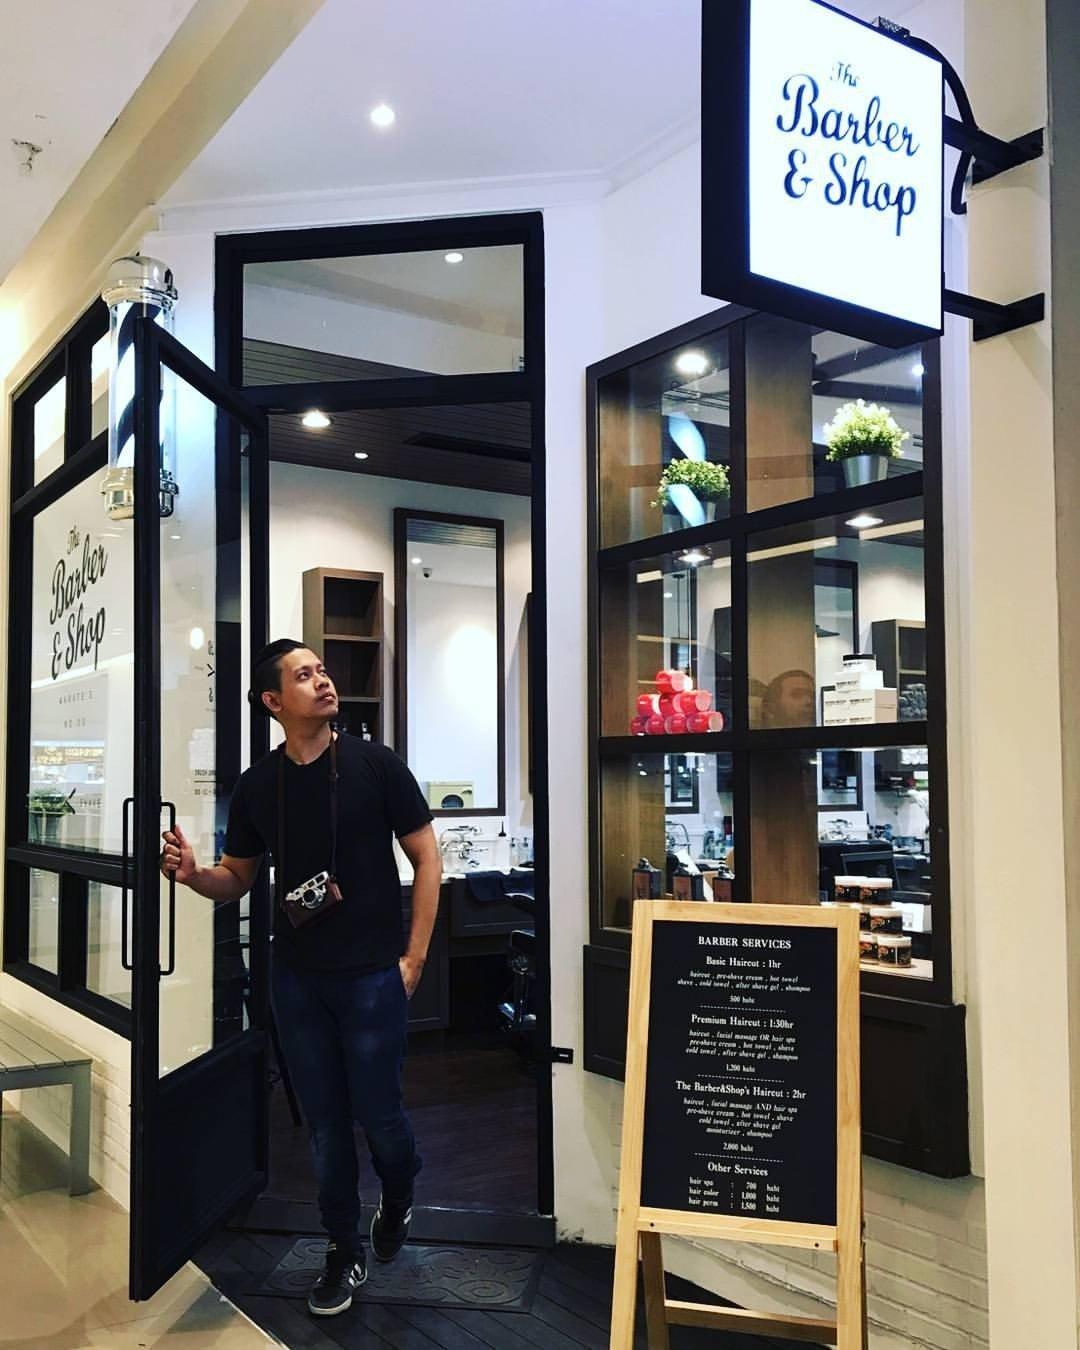 The Barber & Shop Warate's เดอะพาซิโอ ลาดกระบัง